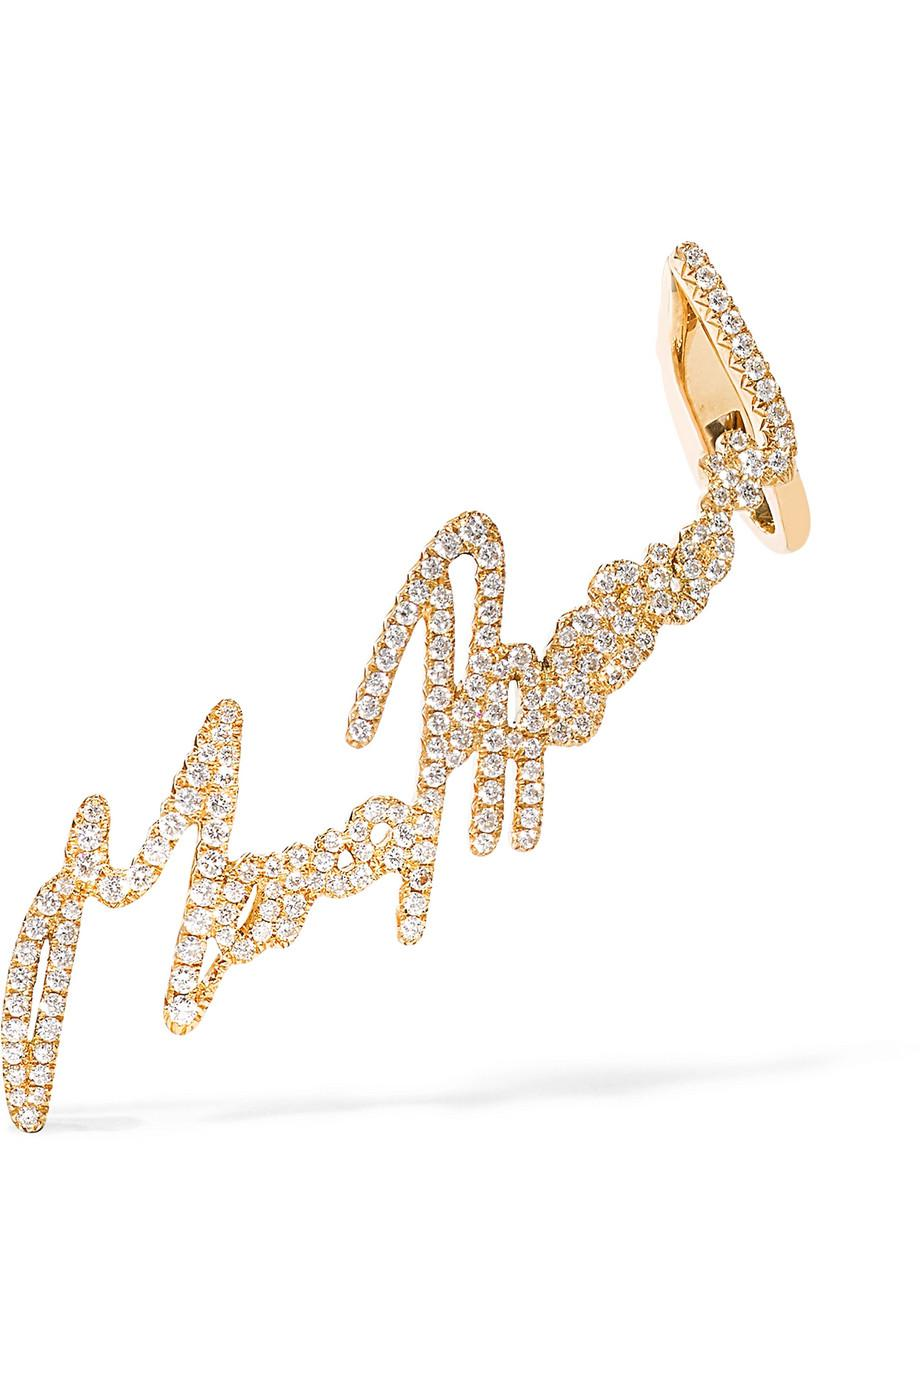 Stephen Webster + Tracey Emin More Passion 18-karat Gold Diamond Ring NilOG